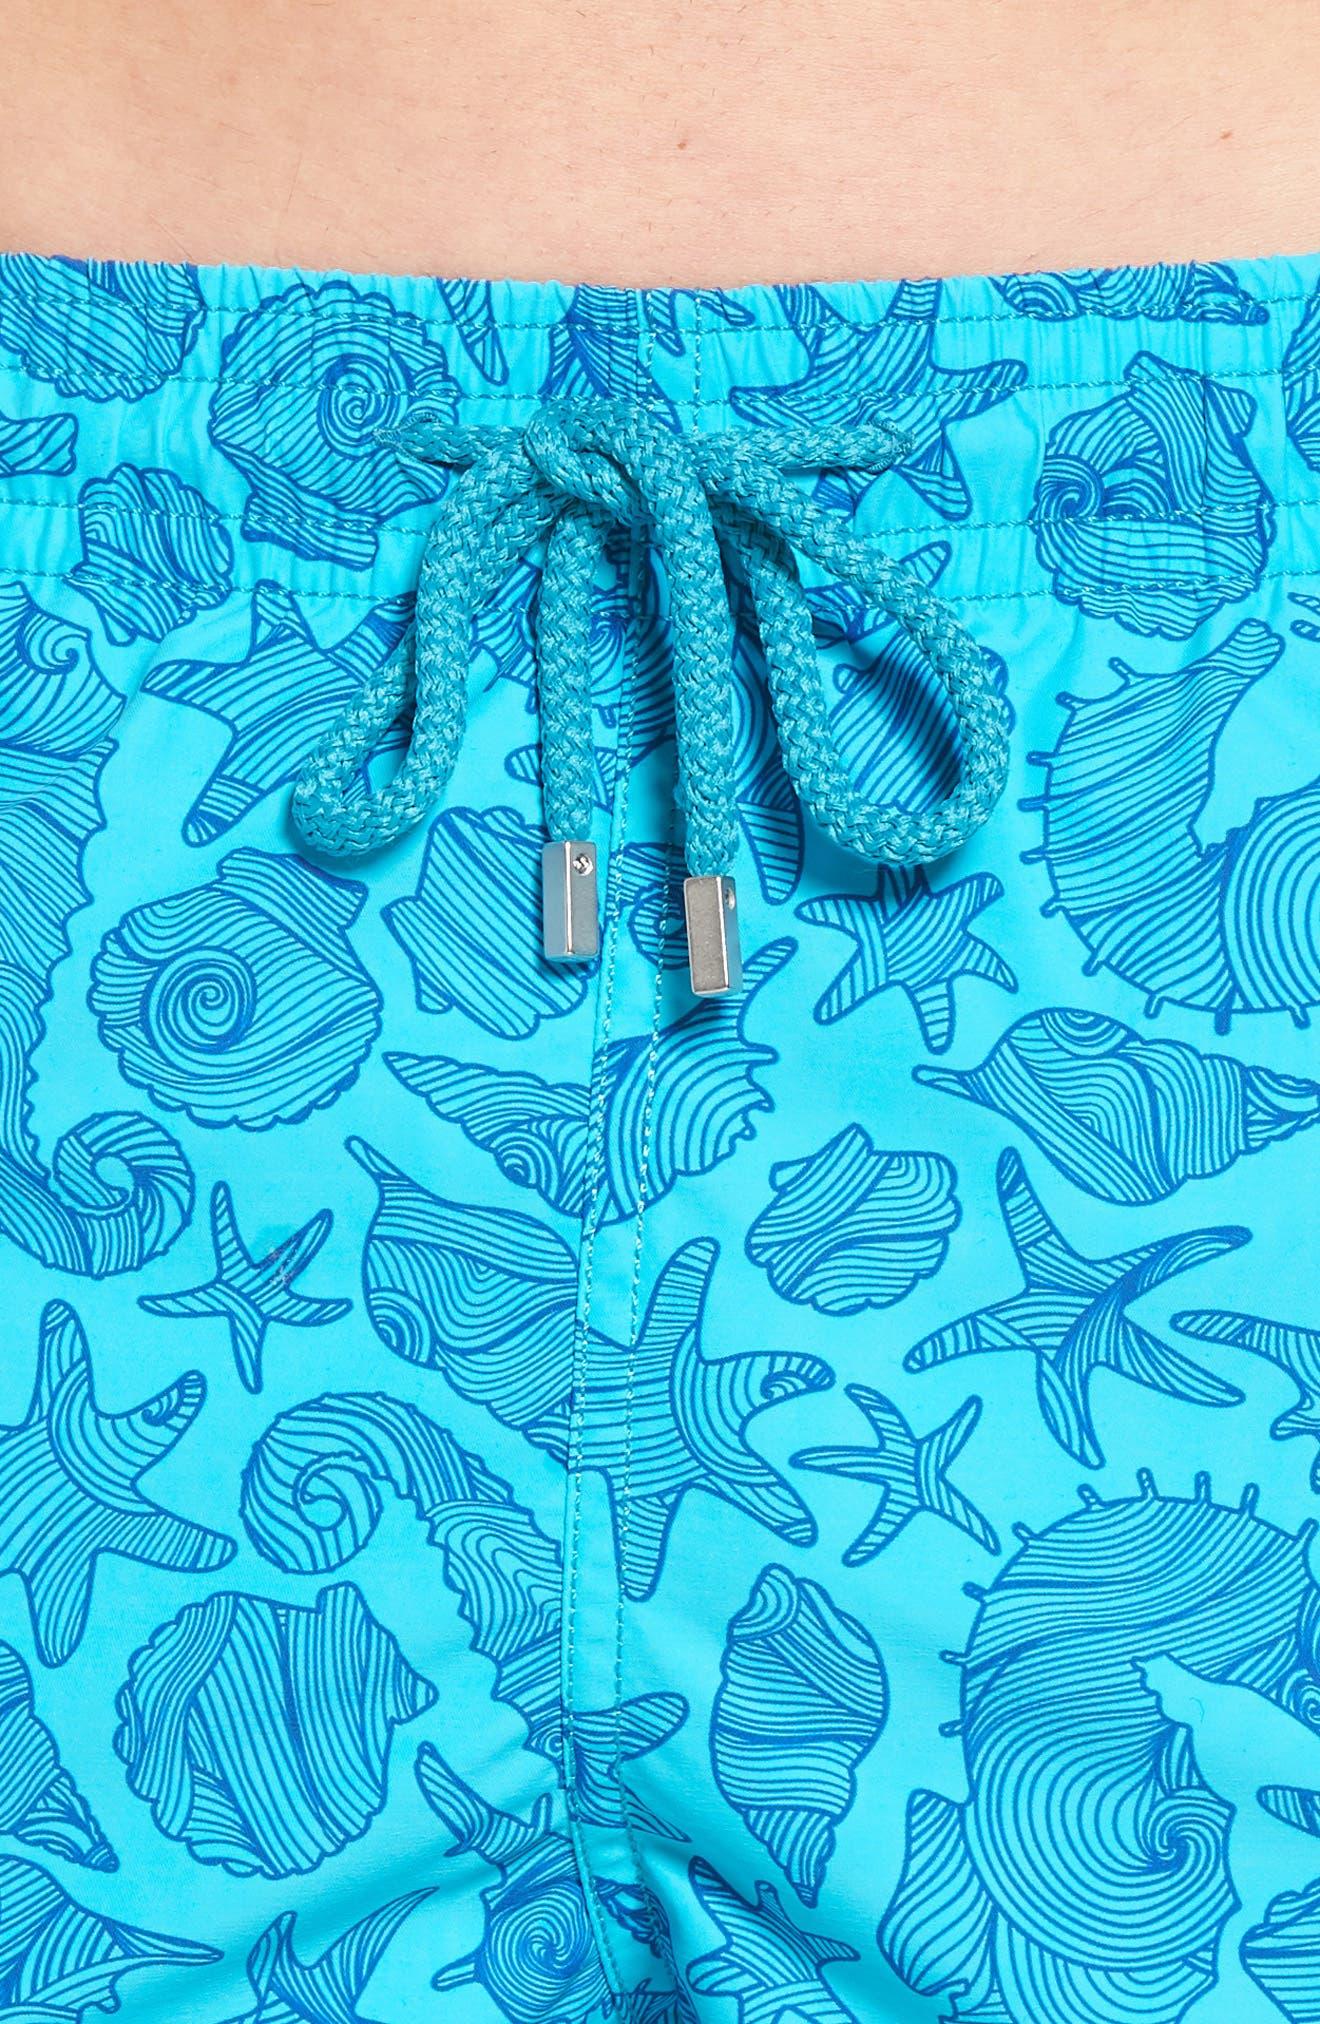 Seahorse Print Swim Trunks,                             Alternate thumbnail 4, color,                             432